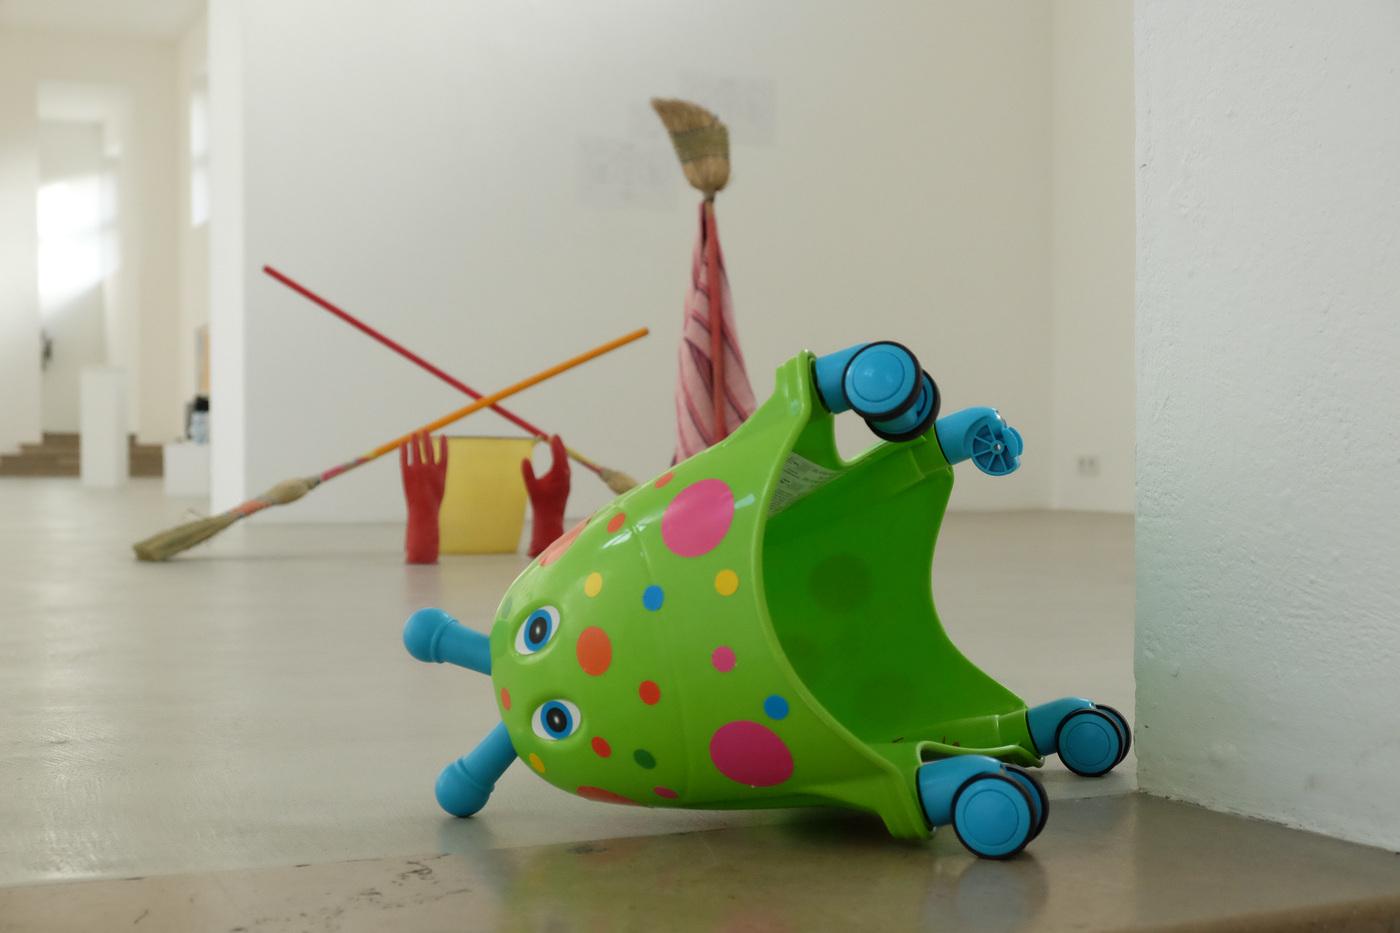 Darius Mikšys, Hayward & Tamayo, Exhibition View in Kunstverein München 2016 © Kunstverein München e.V._21